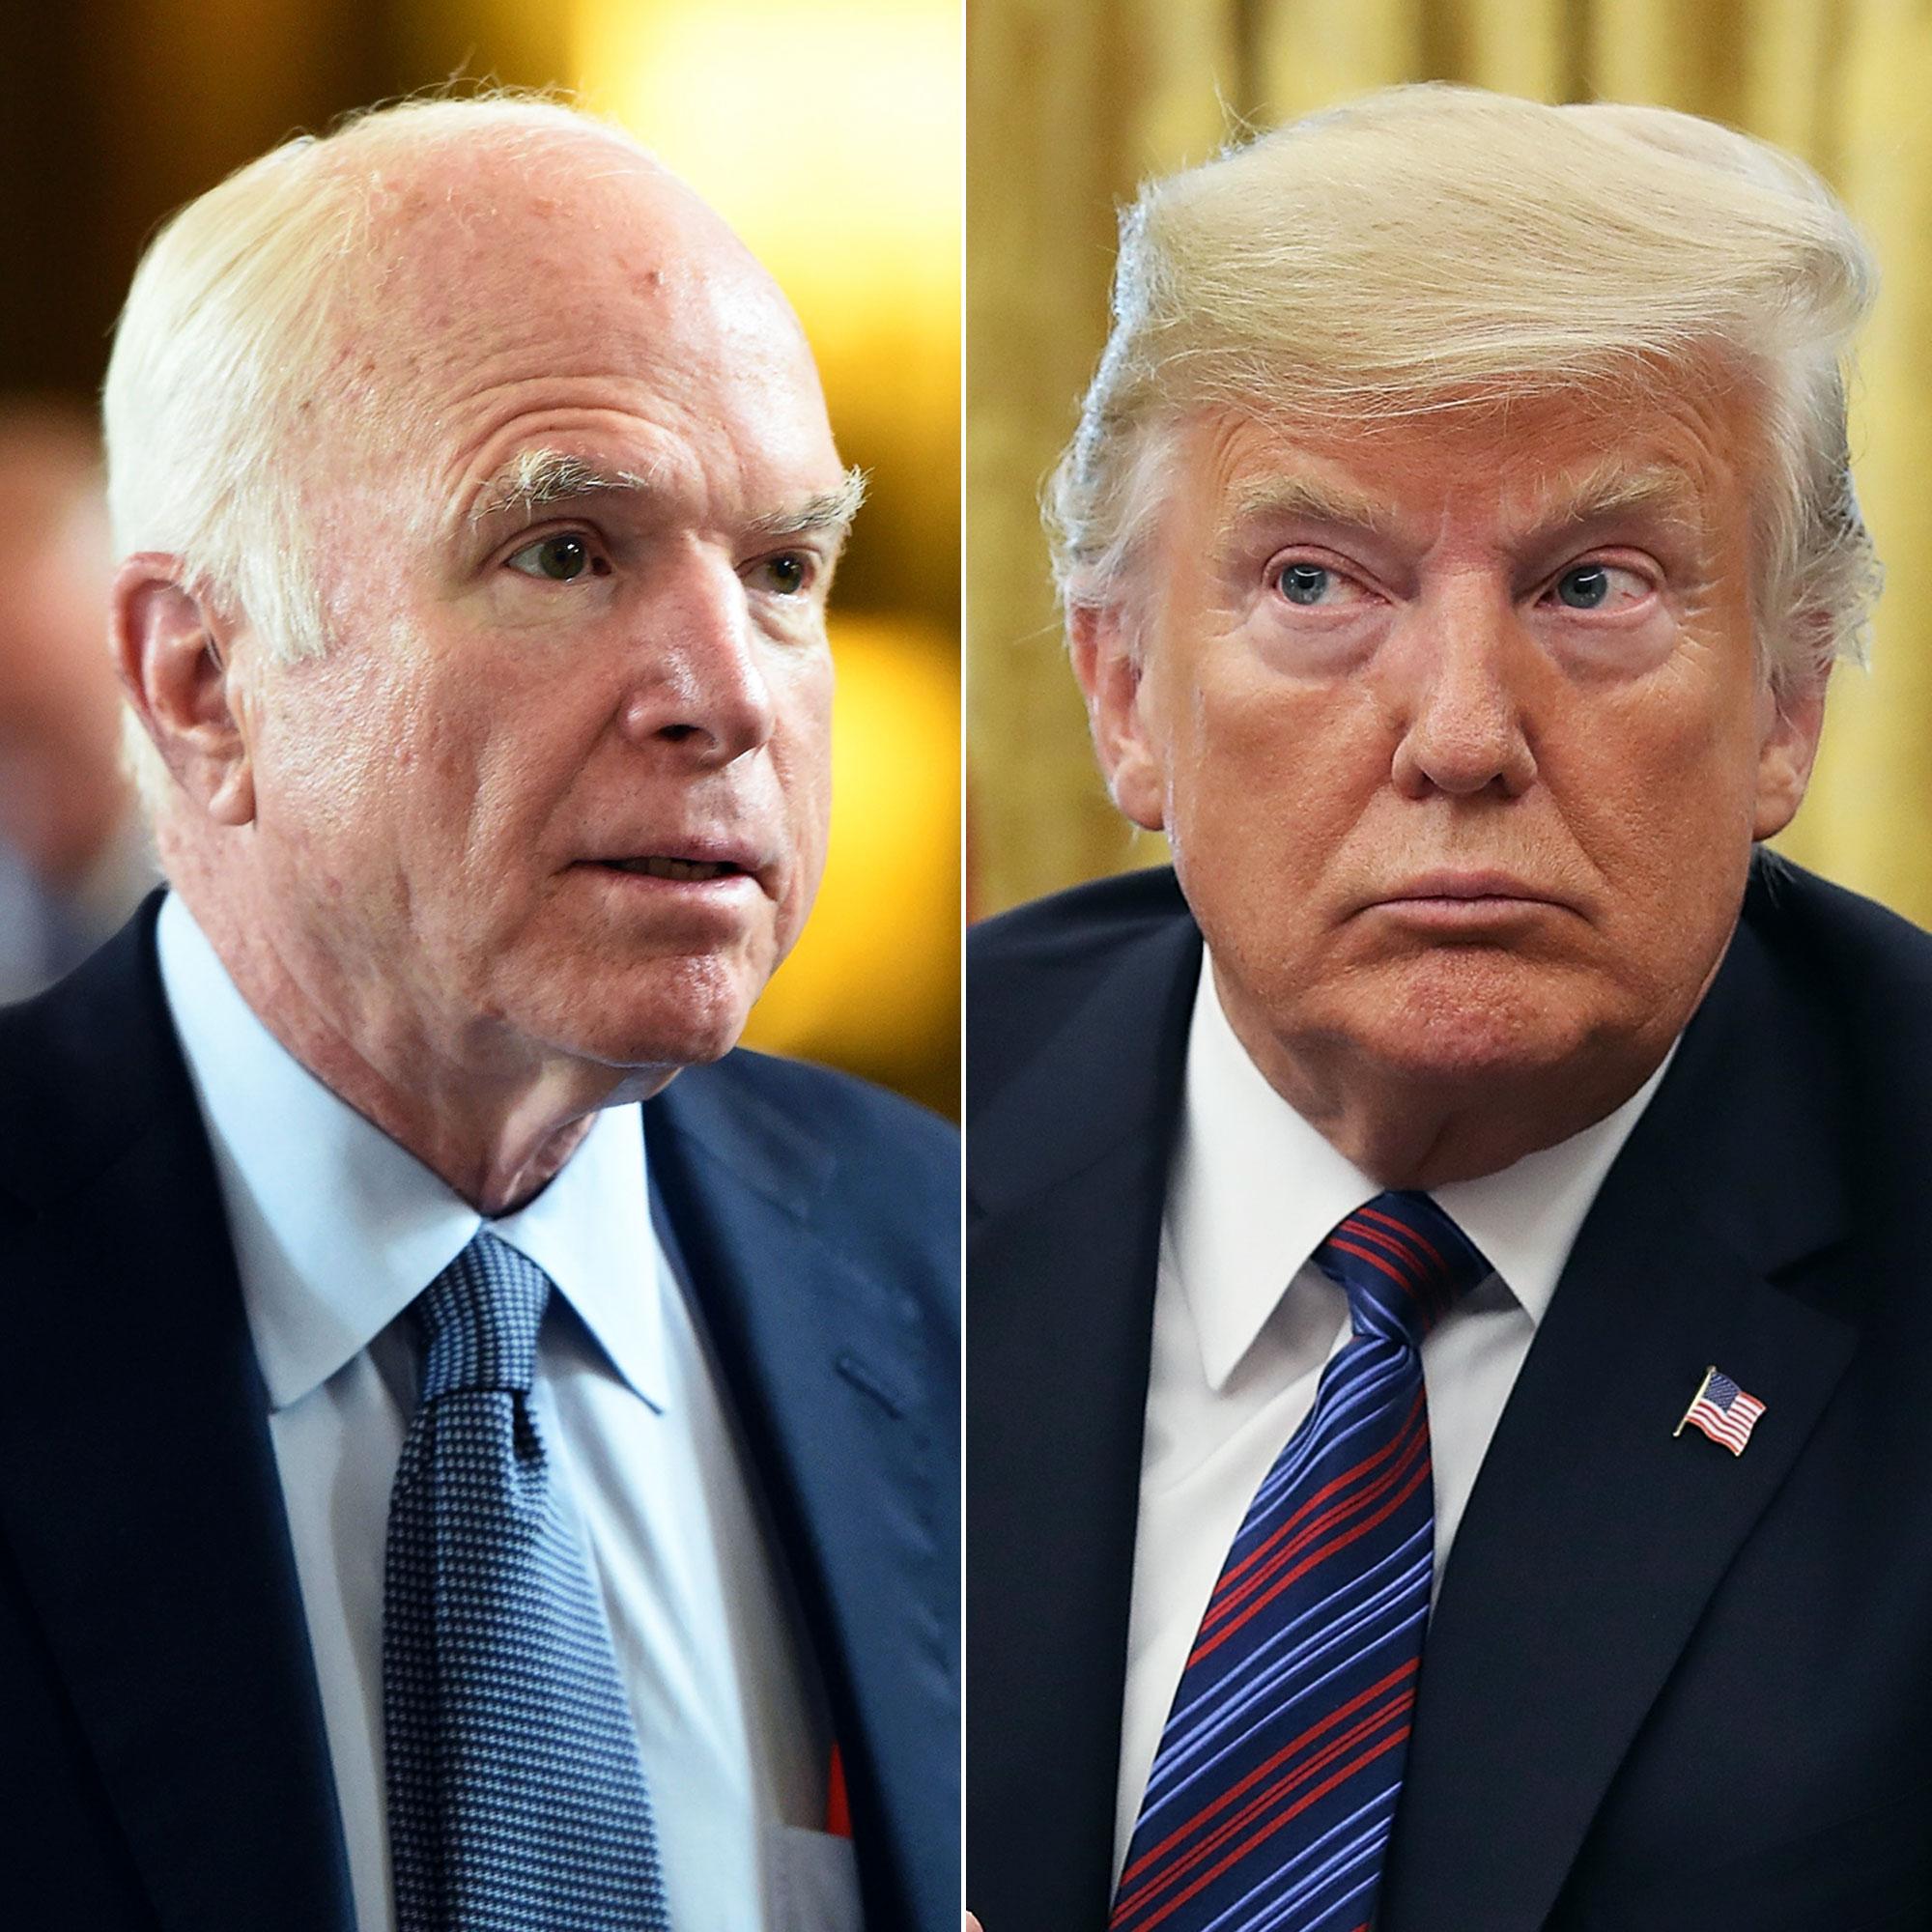 John McCain Takes Aim At Donald Trump In Final Message